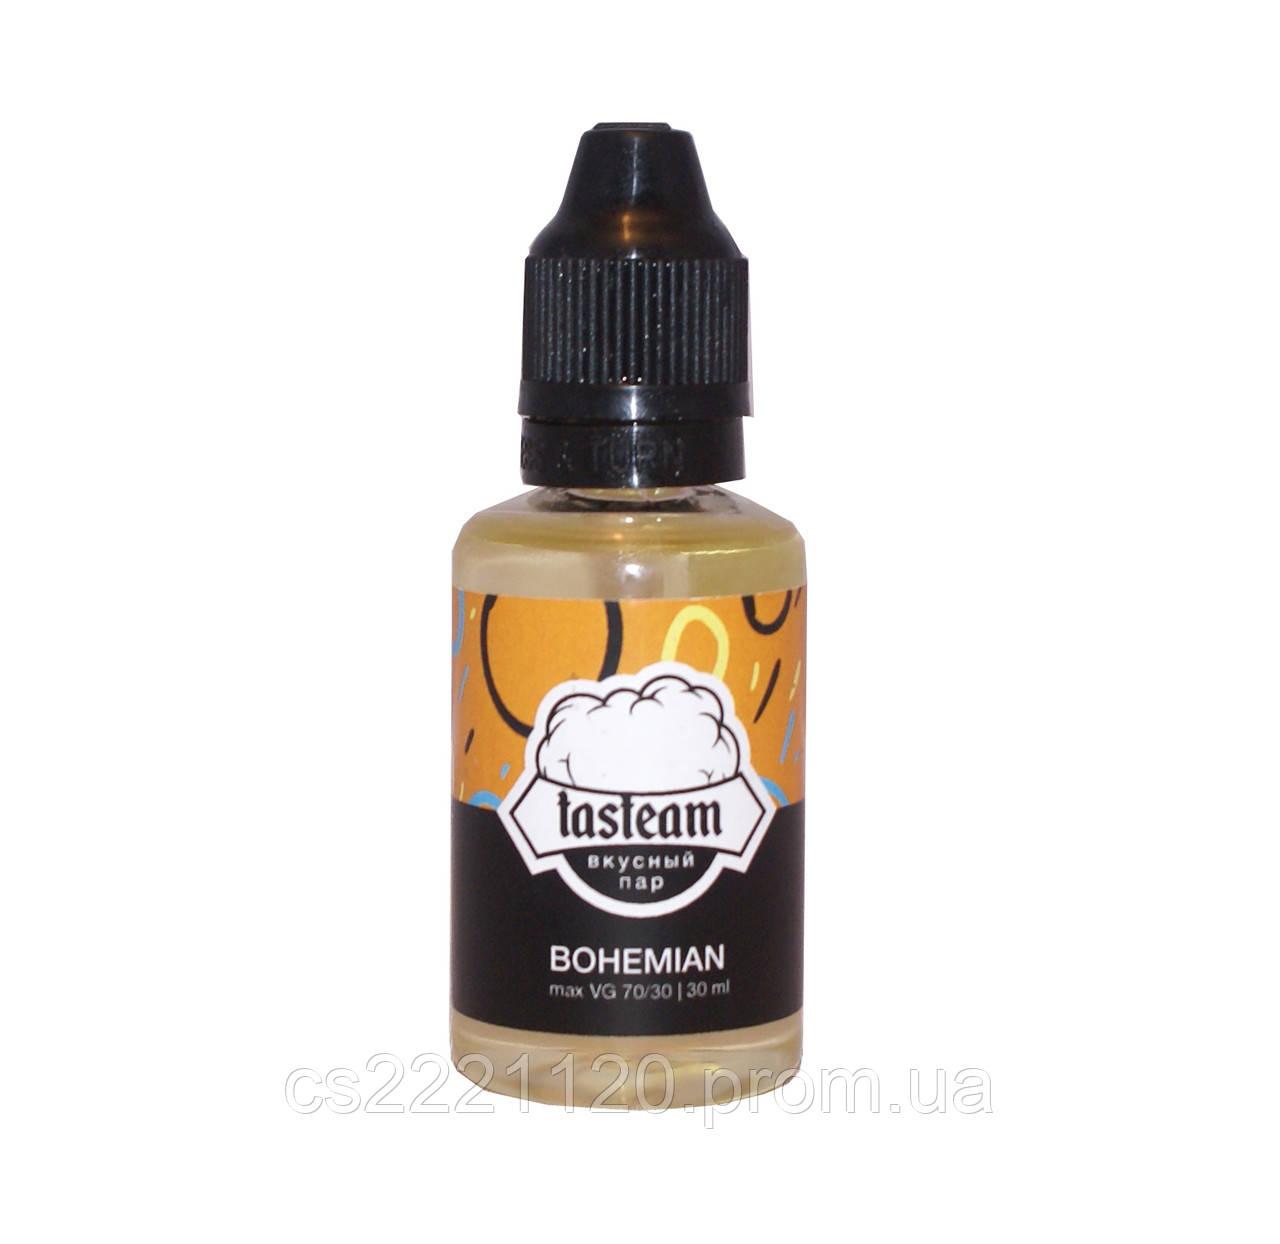 Жидкость TaSTEam Premium line BOHEMIAN 30 ml.